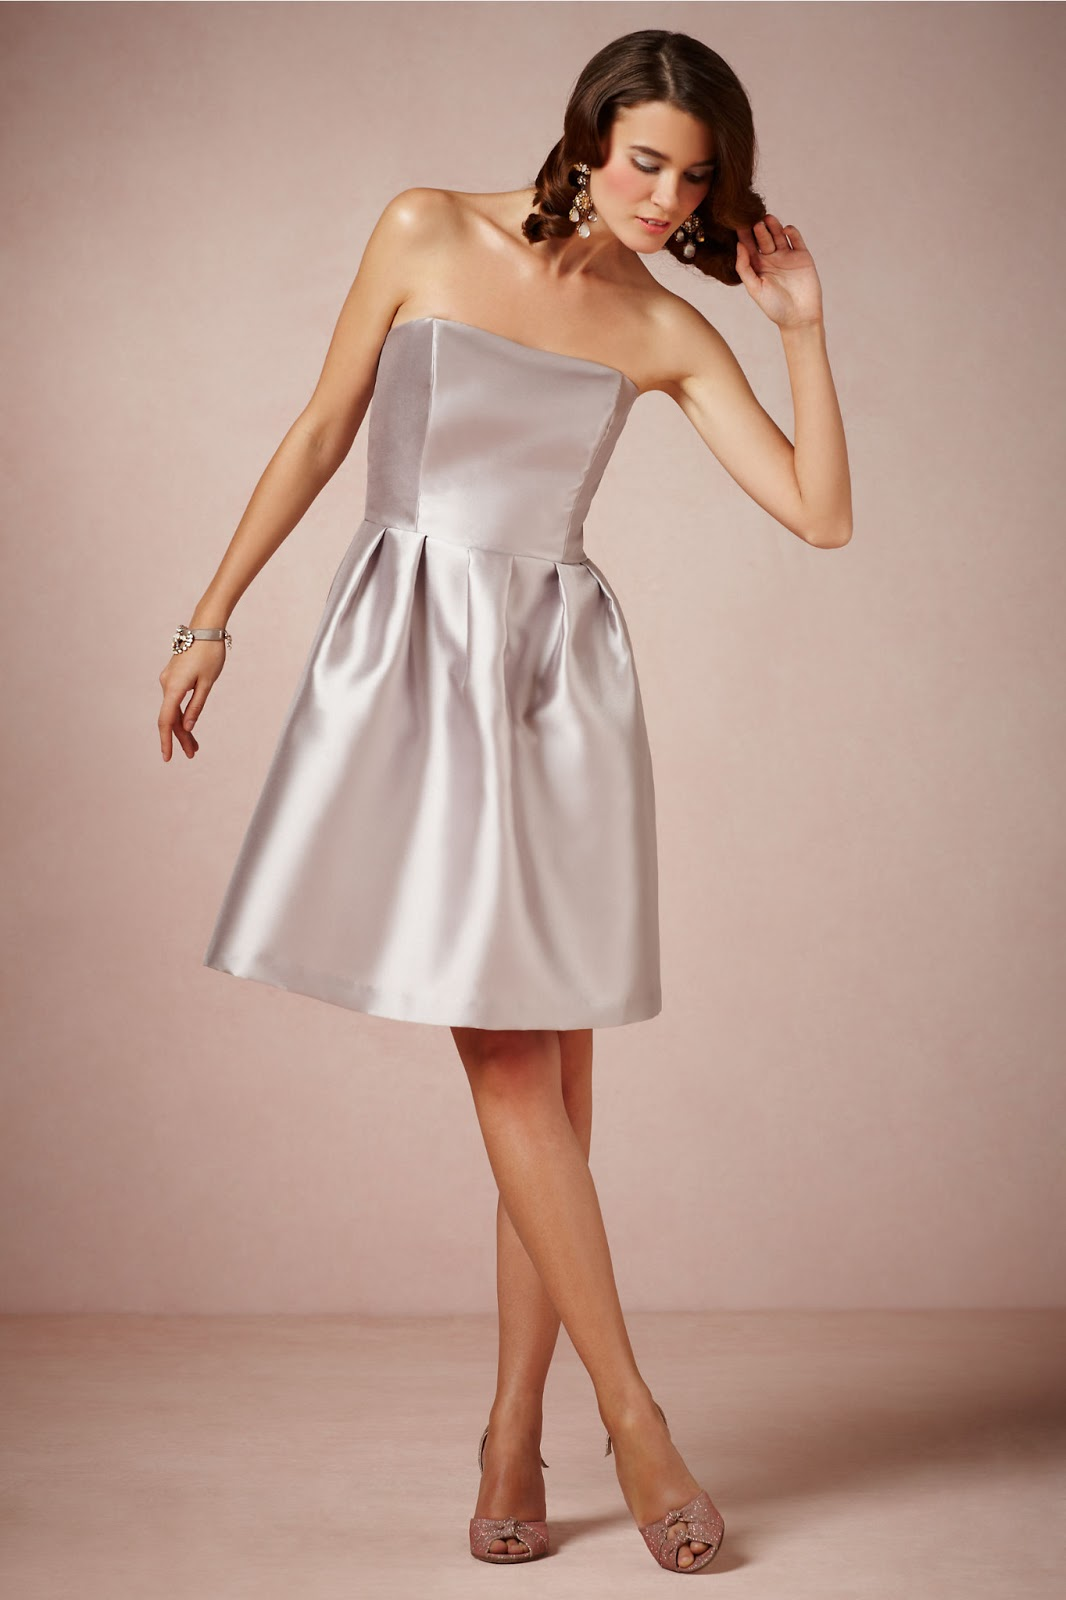 Fashion and stylish dresses blog bridesmaid dresses by bhldn for Wedding dresses like bhldn